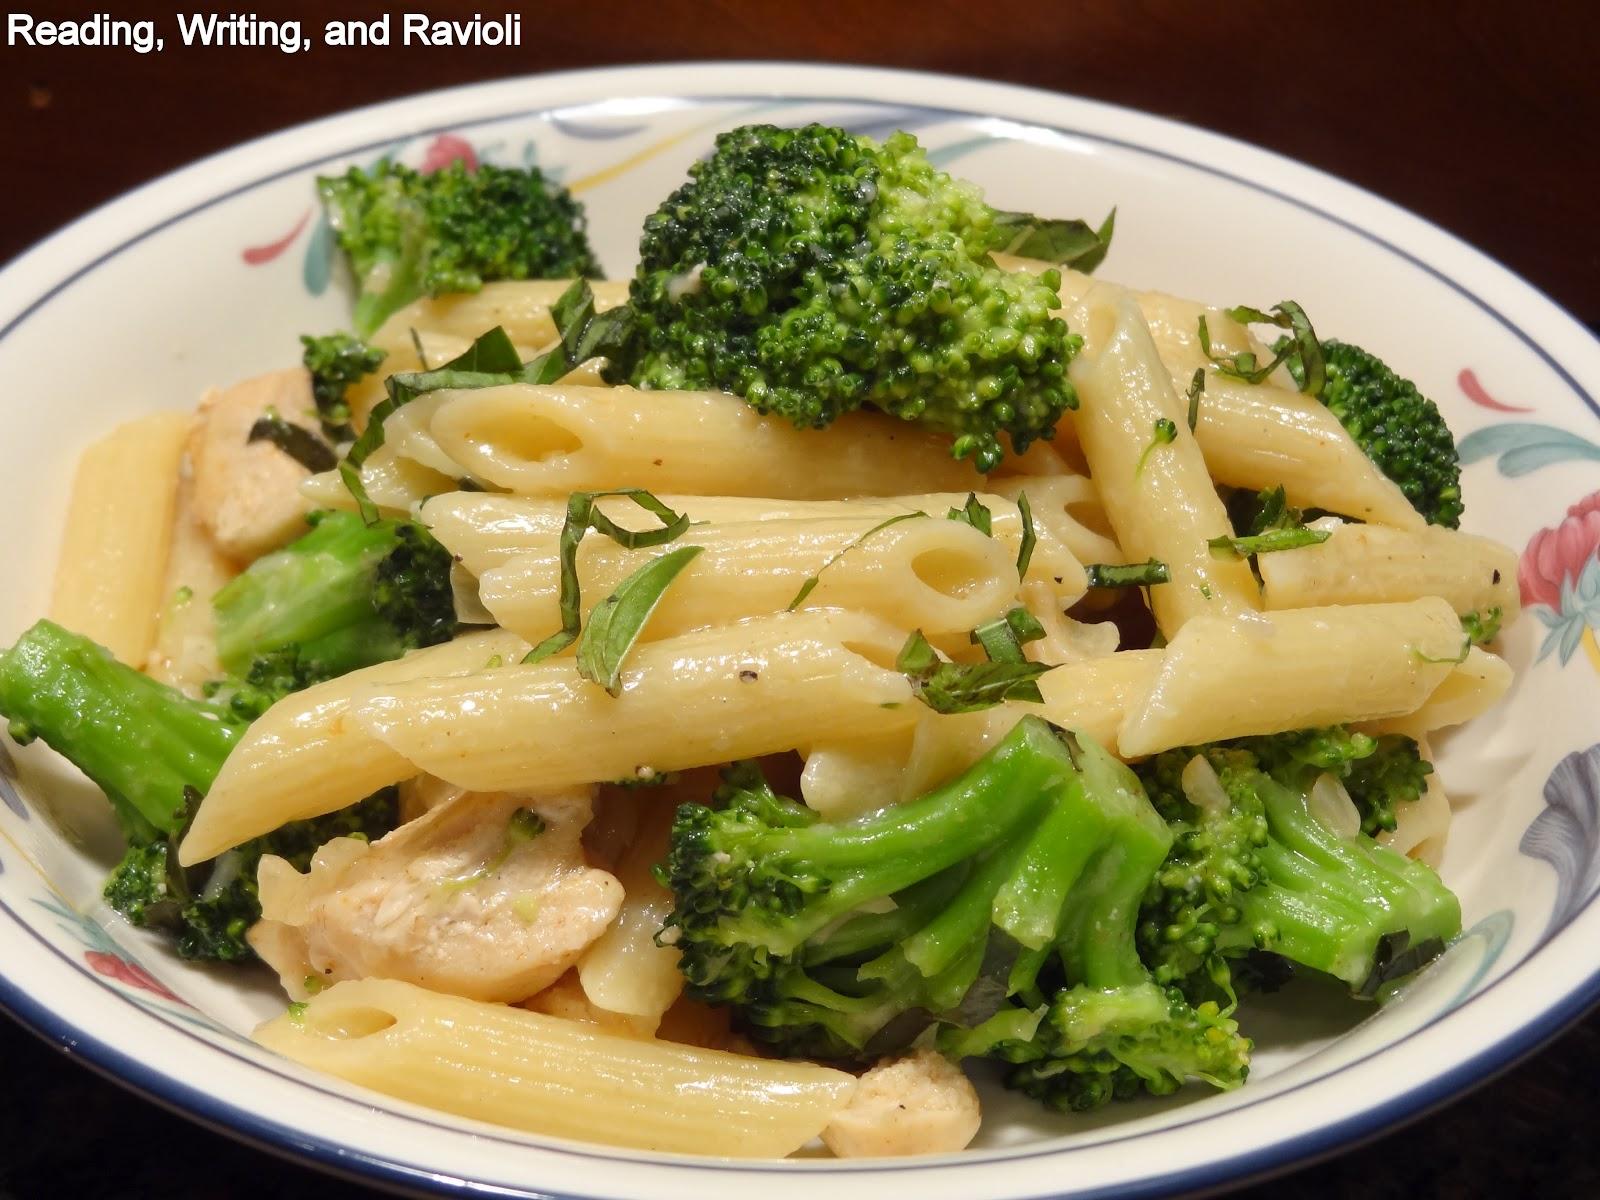 ... : Recipe: Chicken and Broccoli Pasta in a Brown Butter Cream Sauce